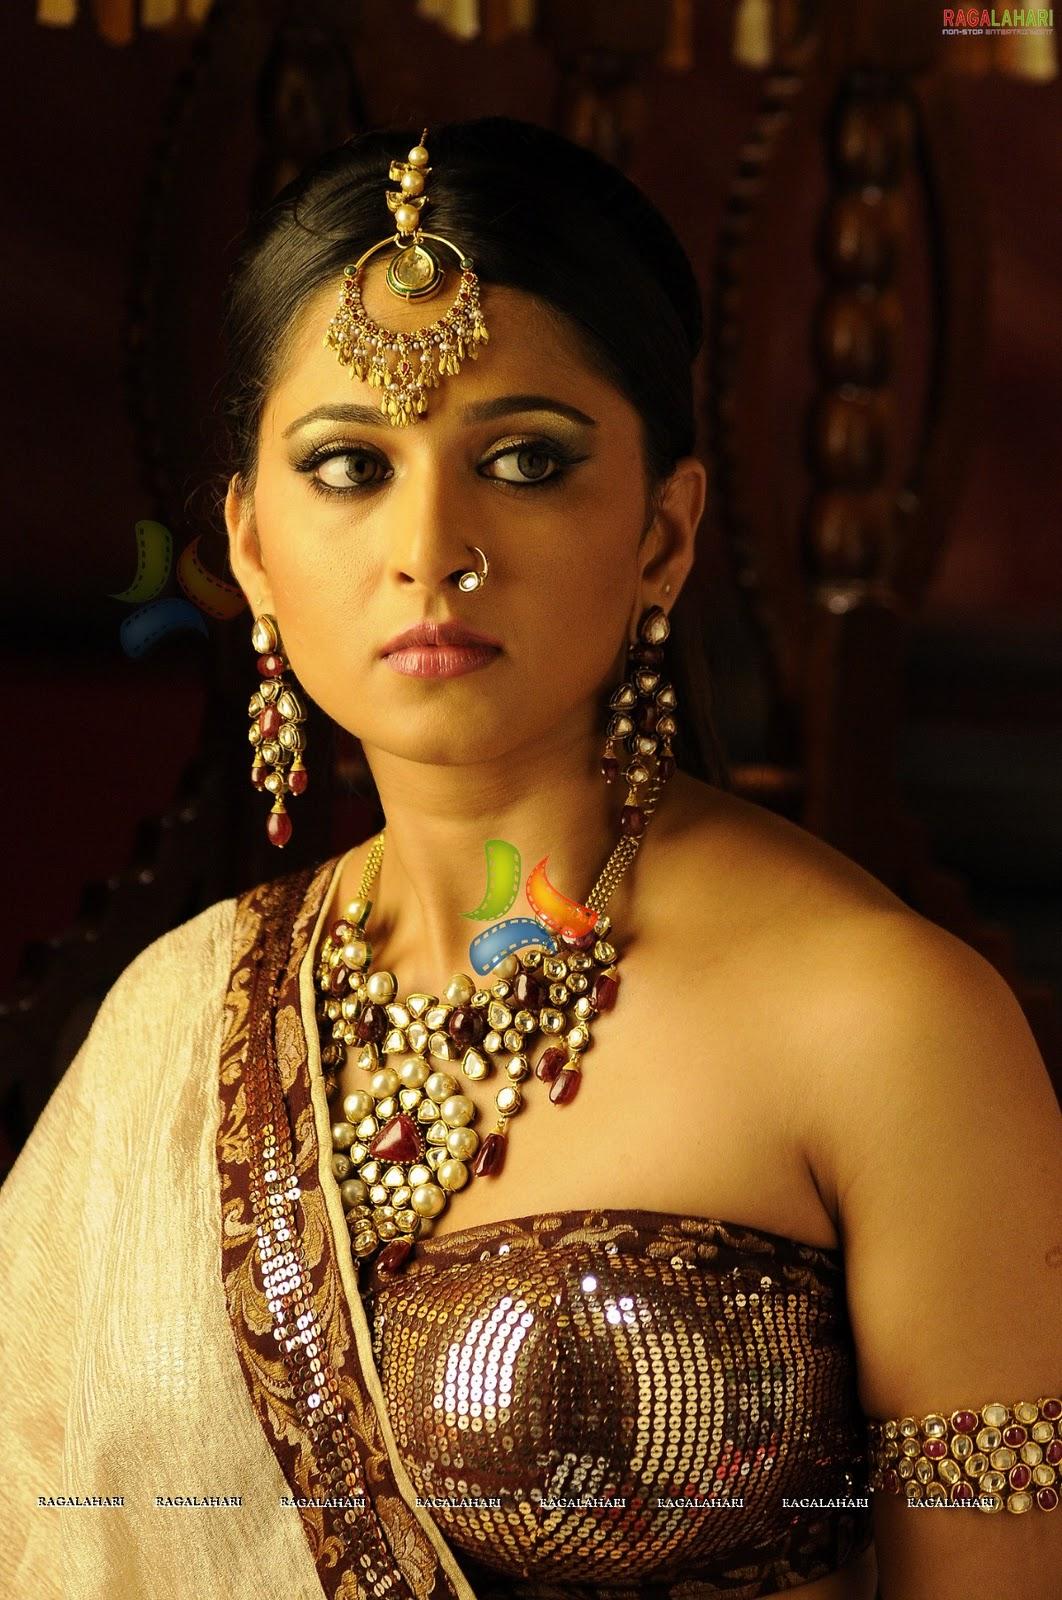 Desi husband load in wife mouth quot kitna ganda haiquot - 4 8